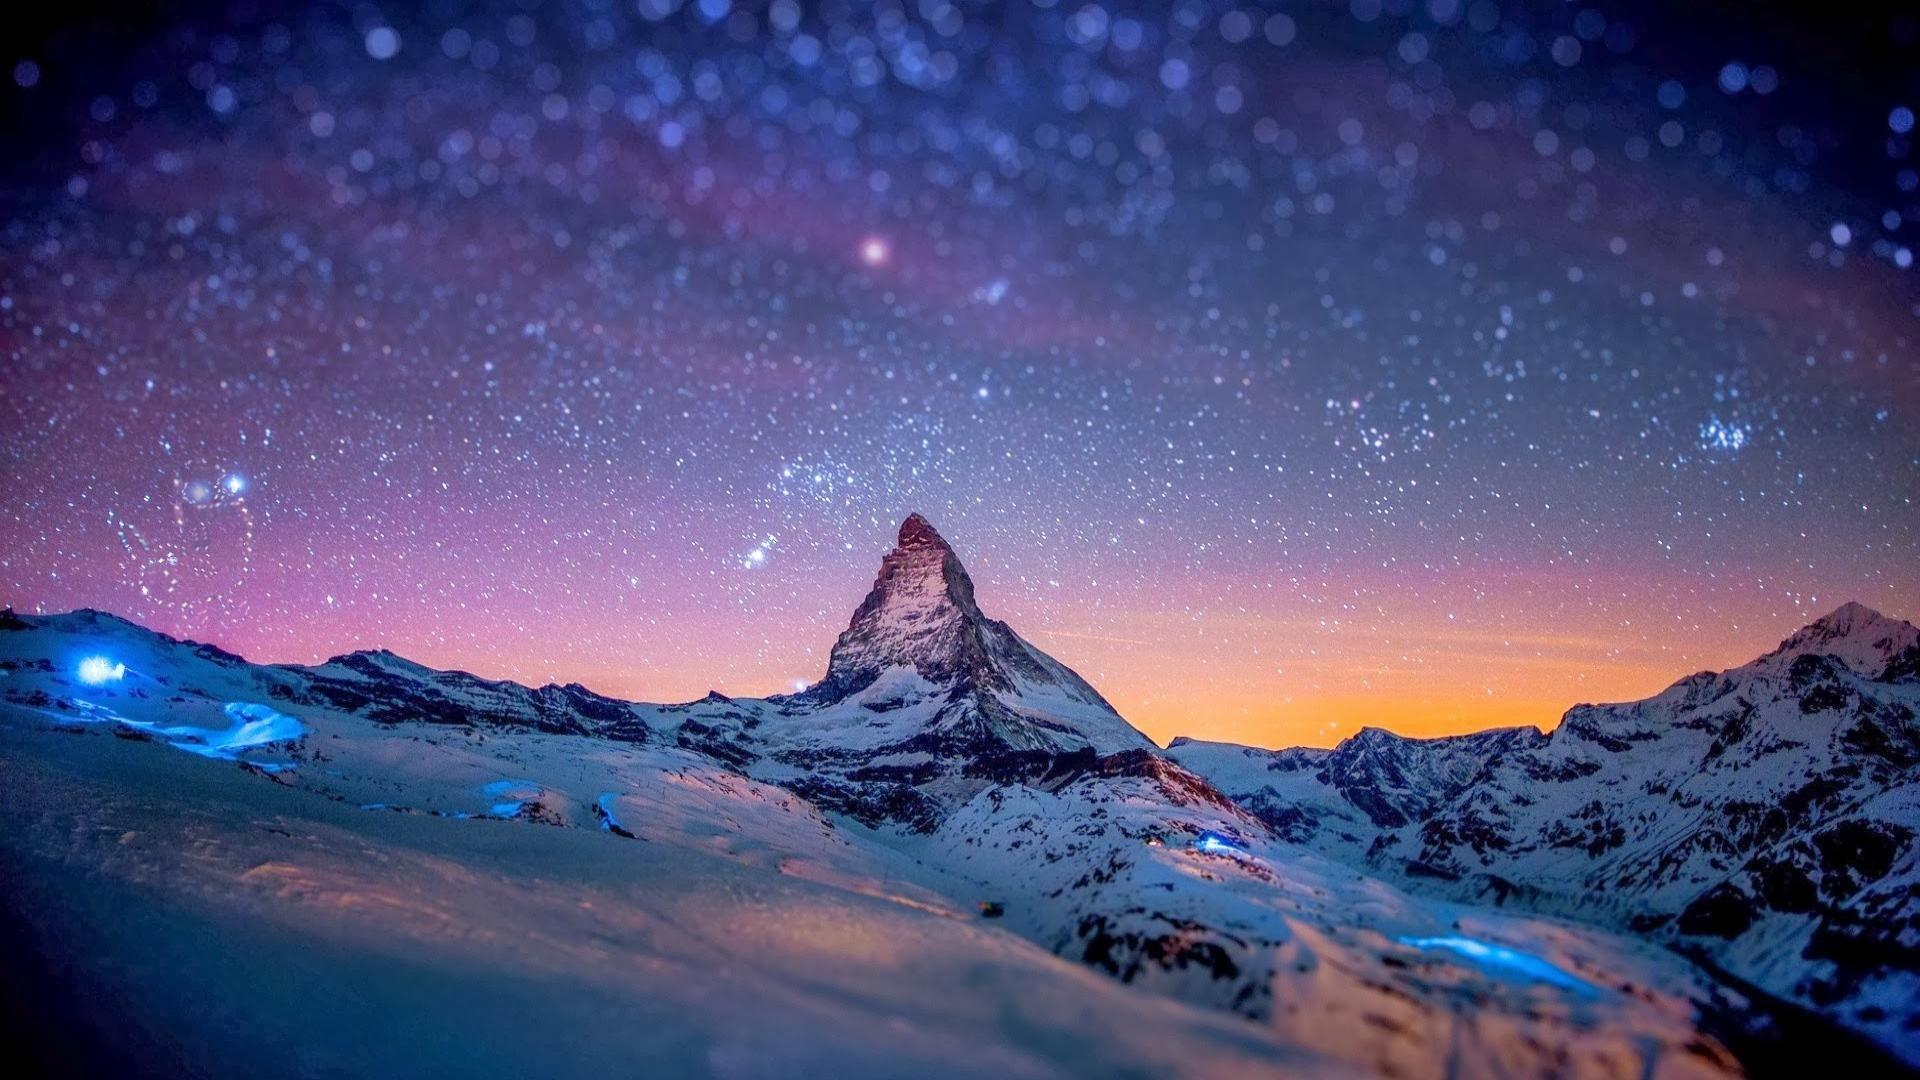 Sfondi belli 74 immagini for Foto paesaggi naturali gratis